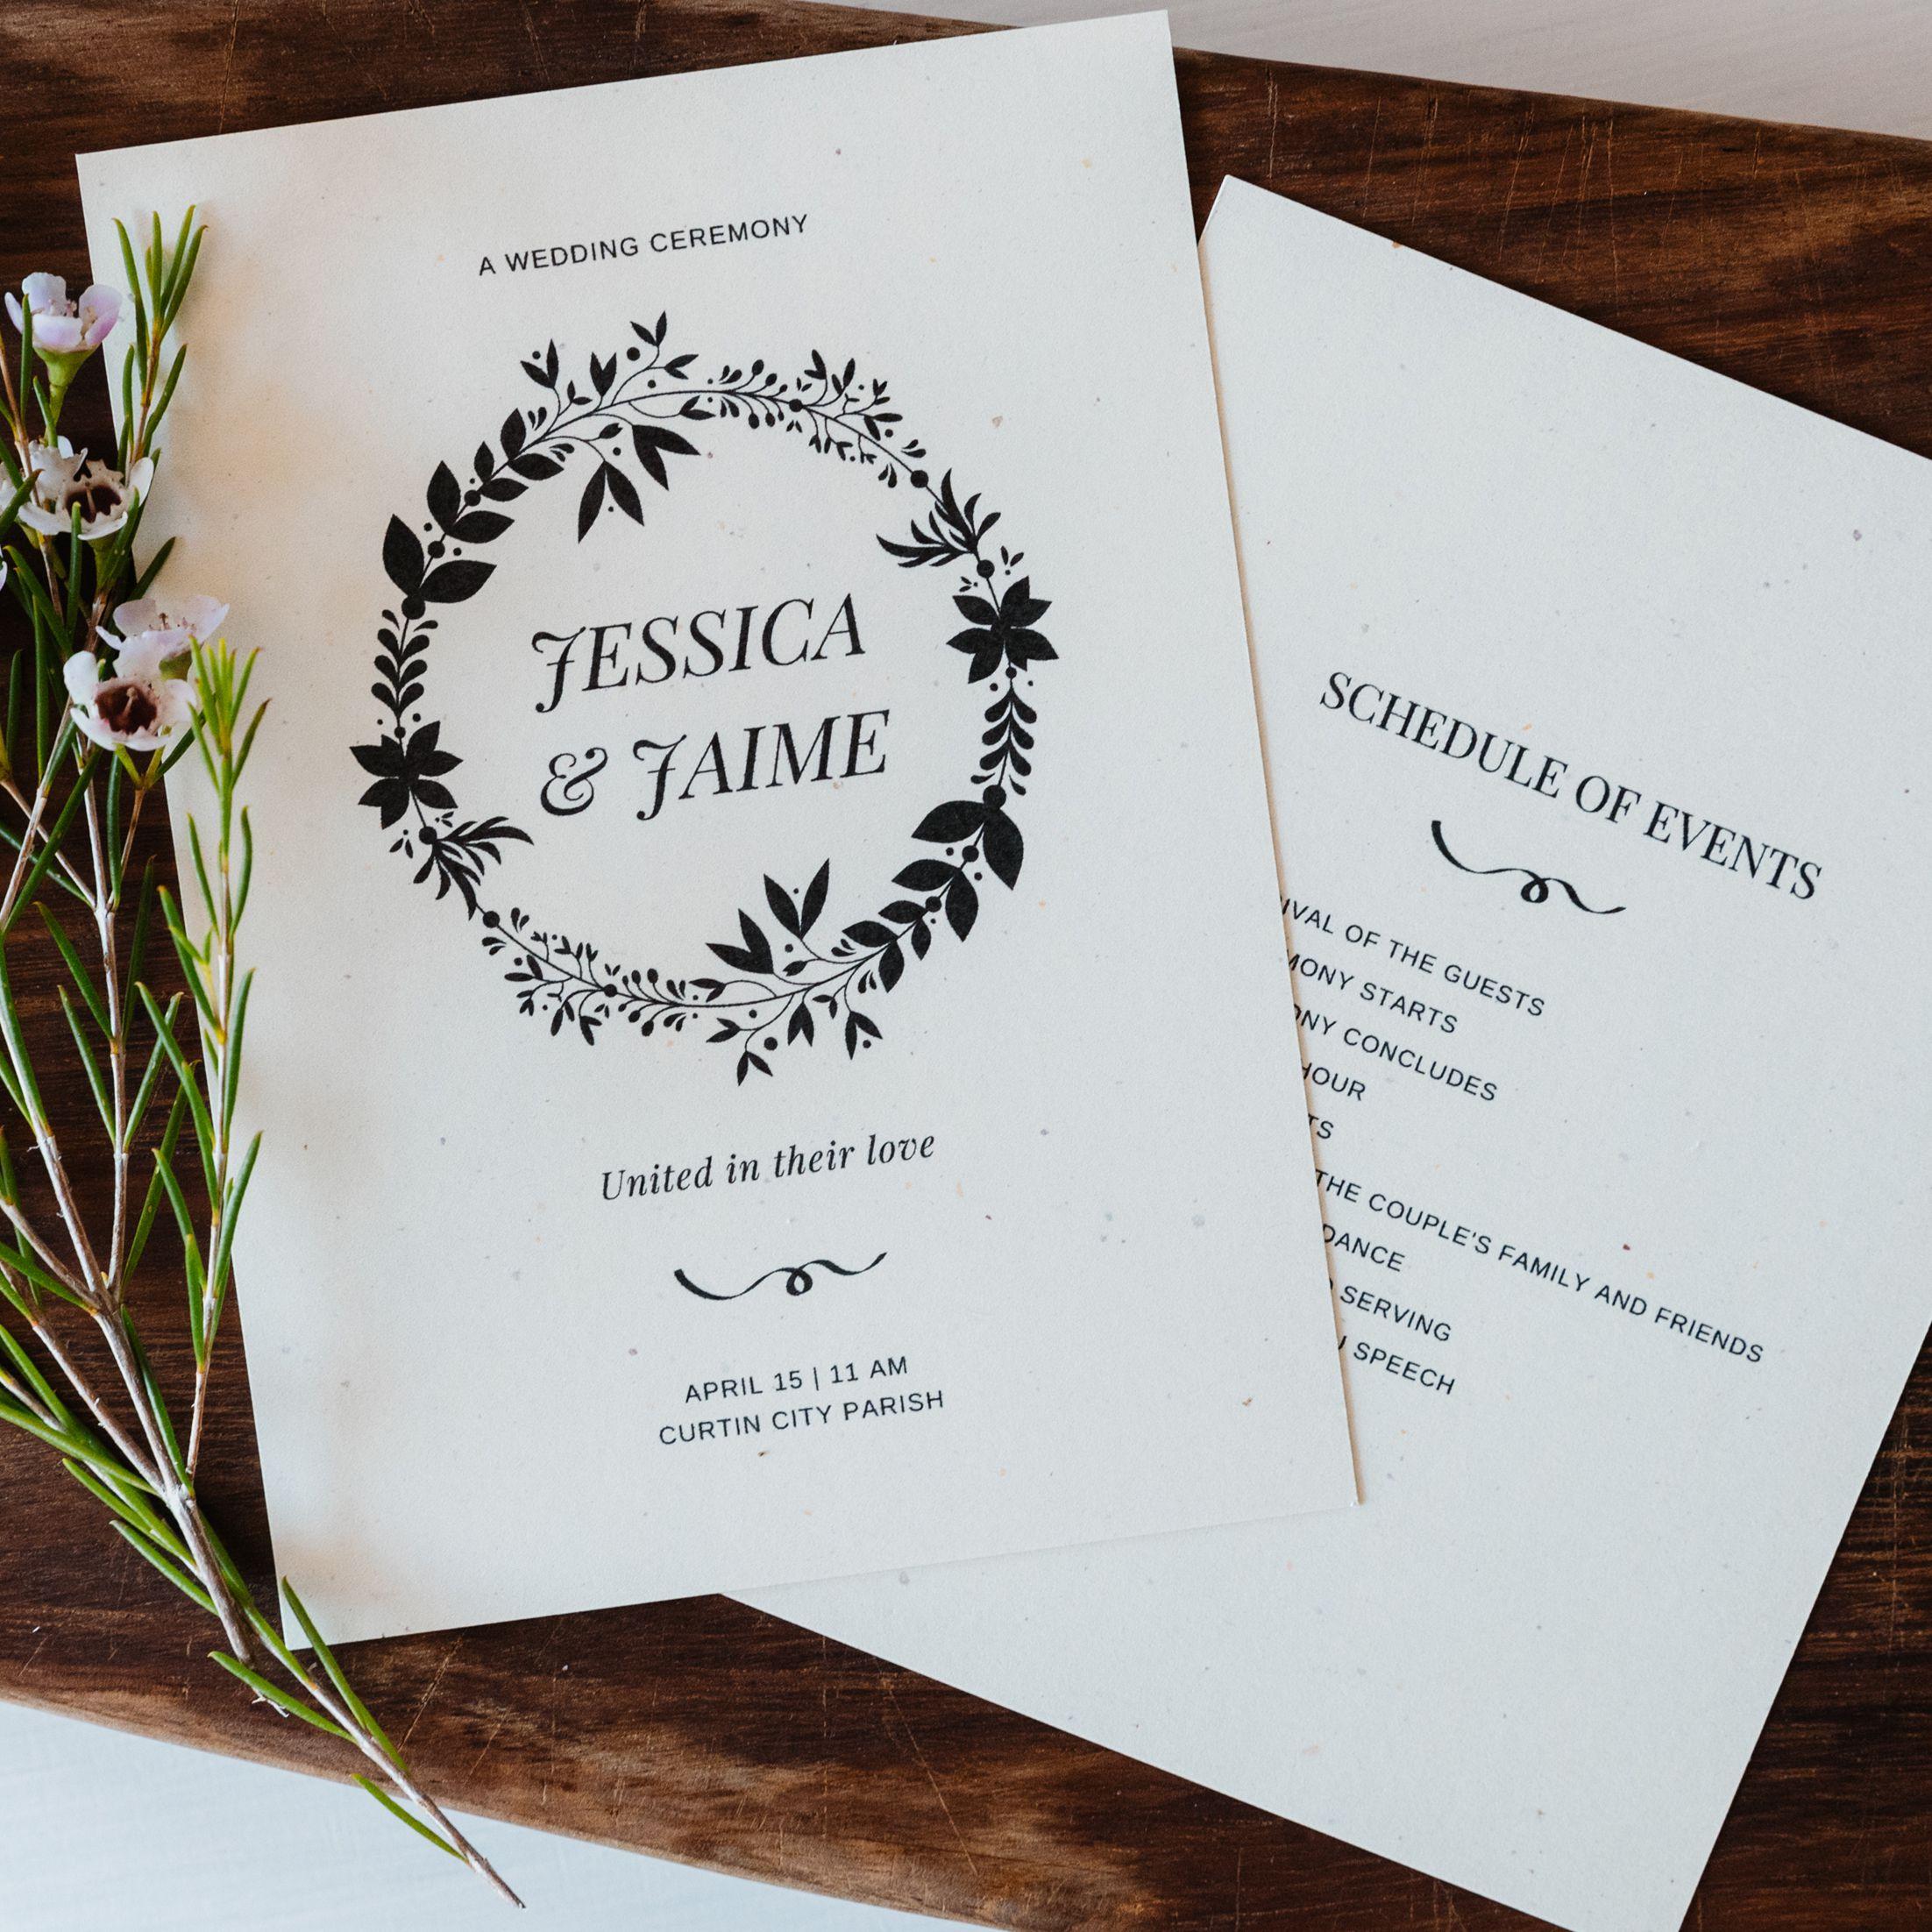 Free Wedding Program Templates You Can Customize Inside Church Program Templates Word